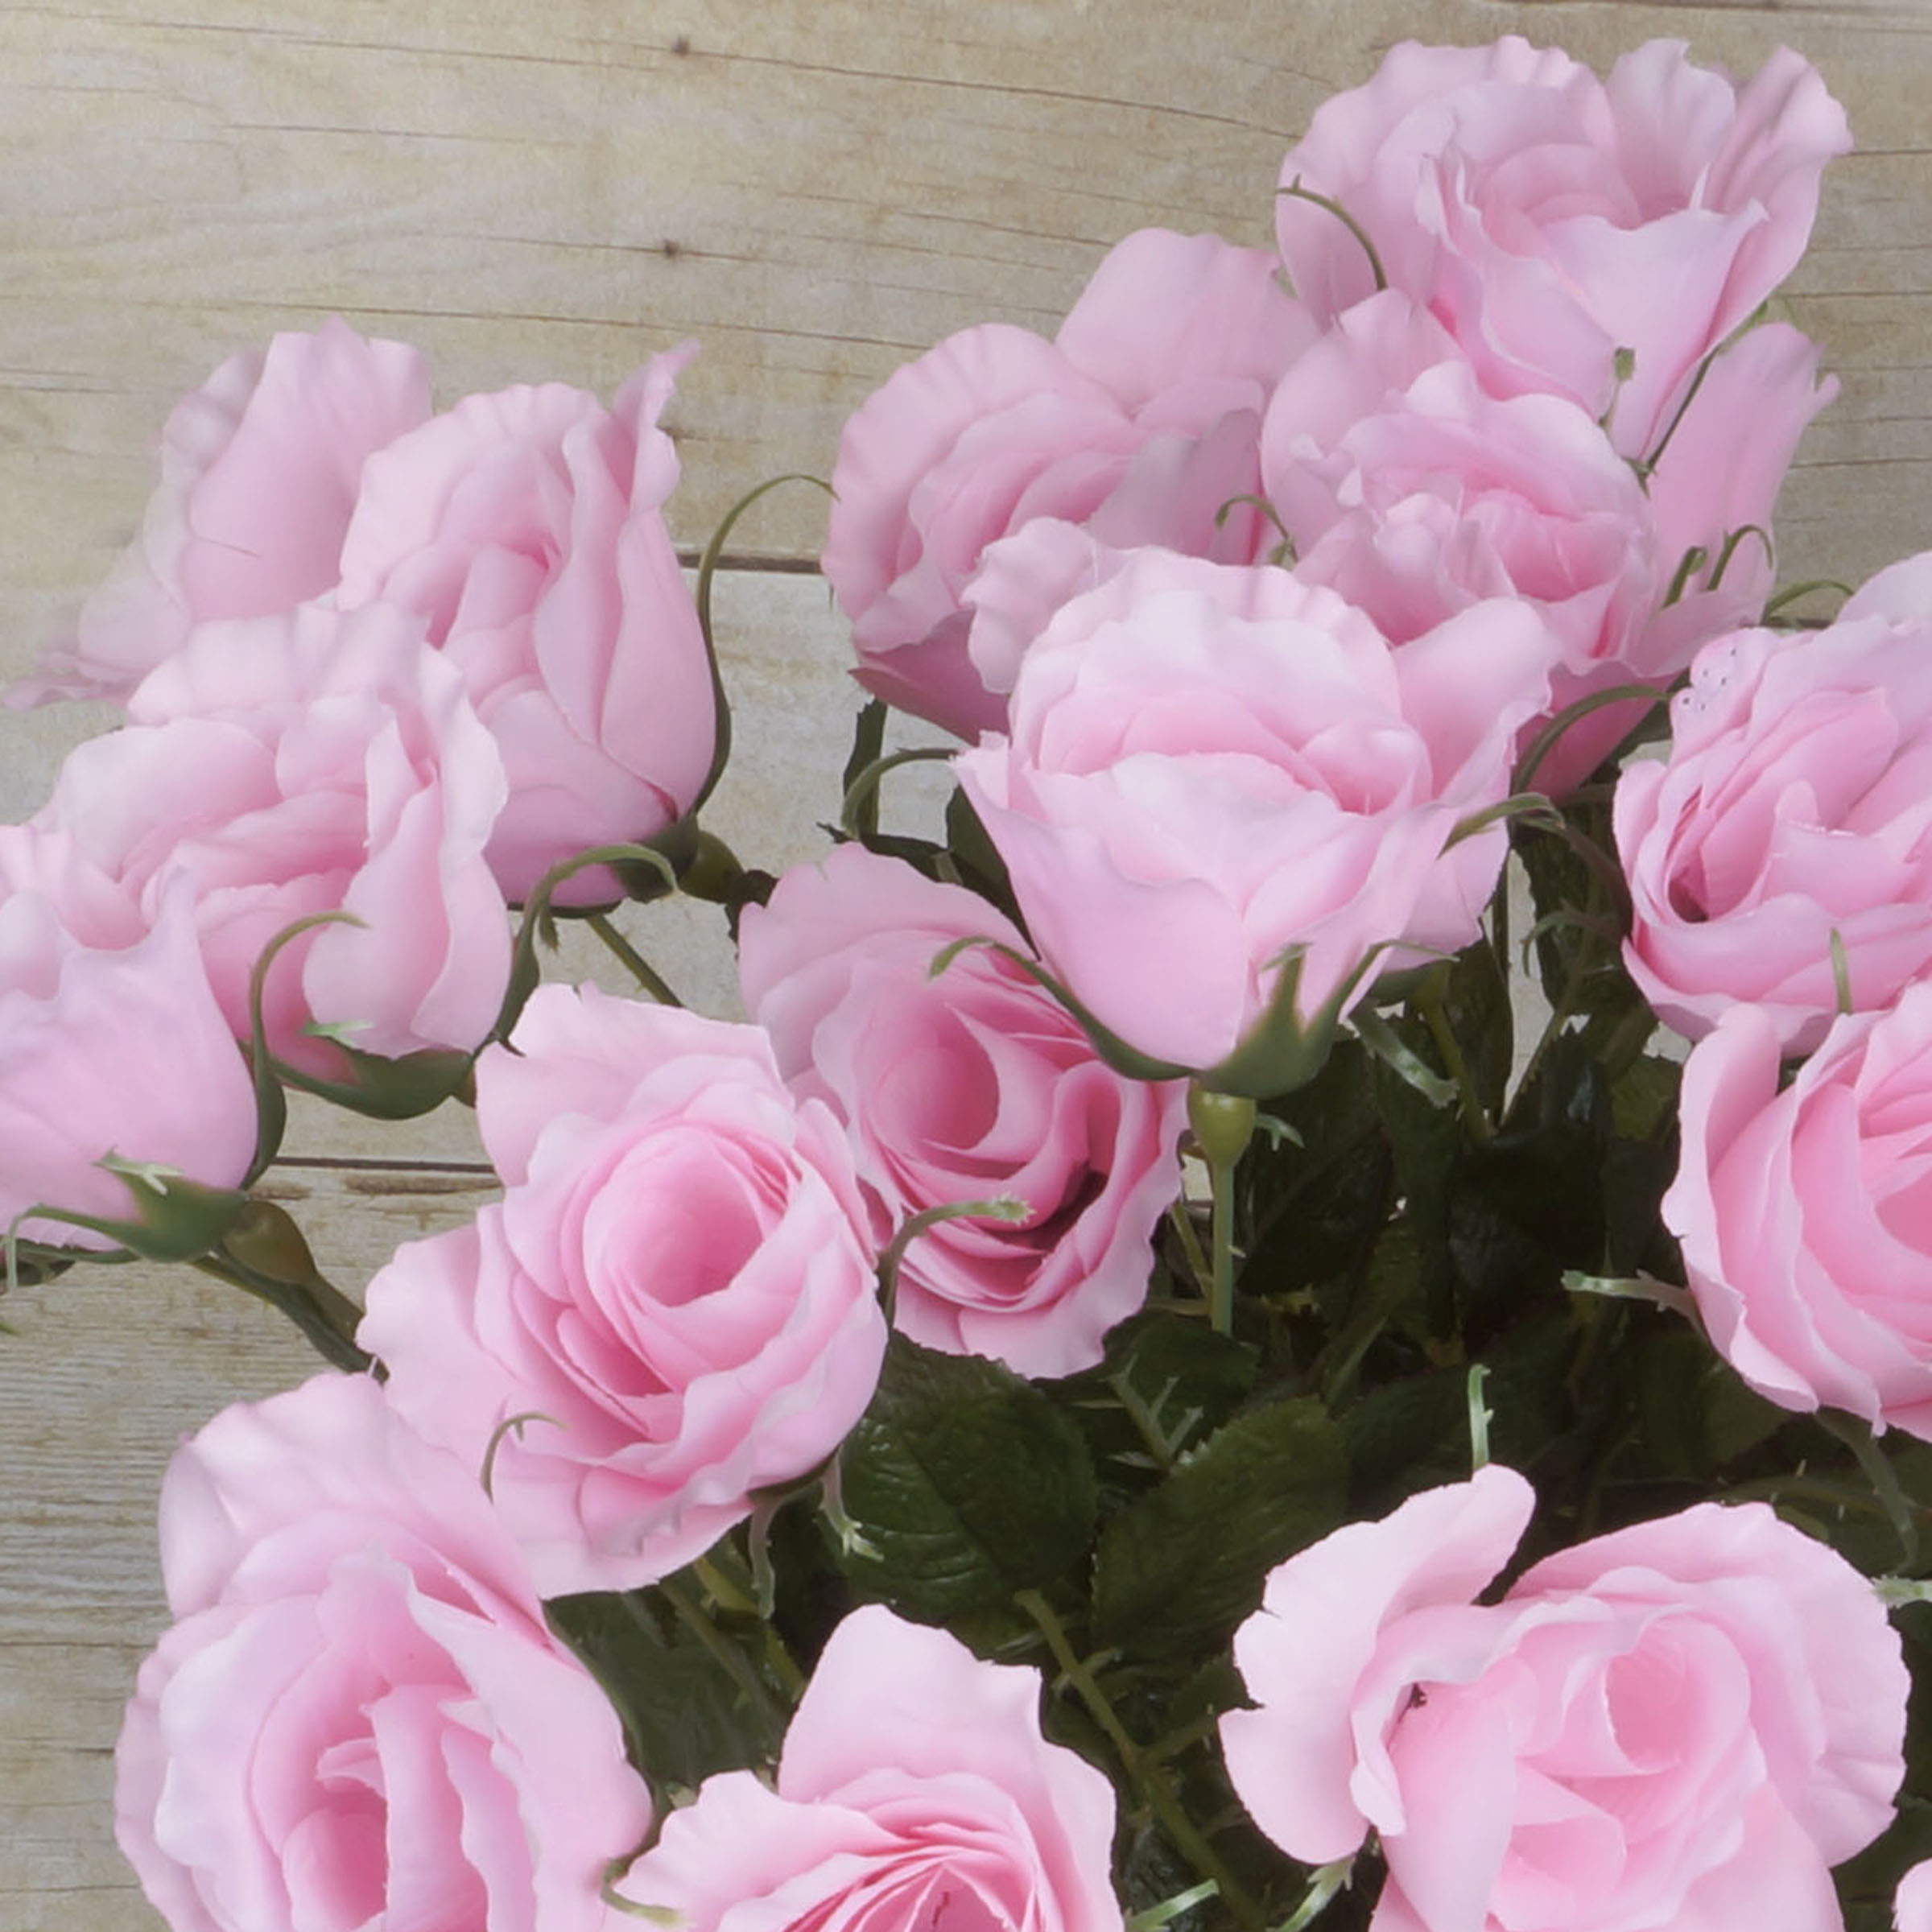 Efavormart 48 Pcs Long Single Stem Rose Bundles Wedding Artificial